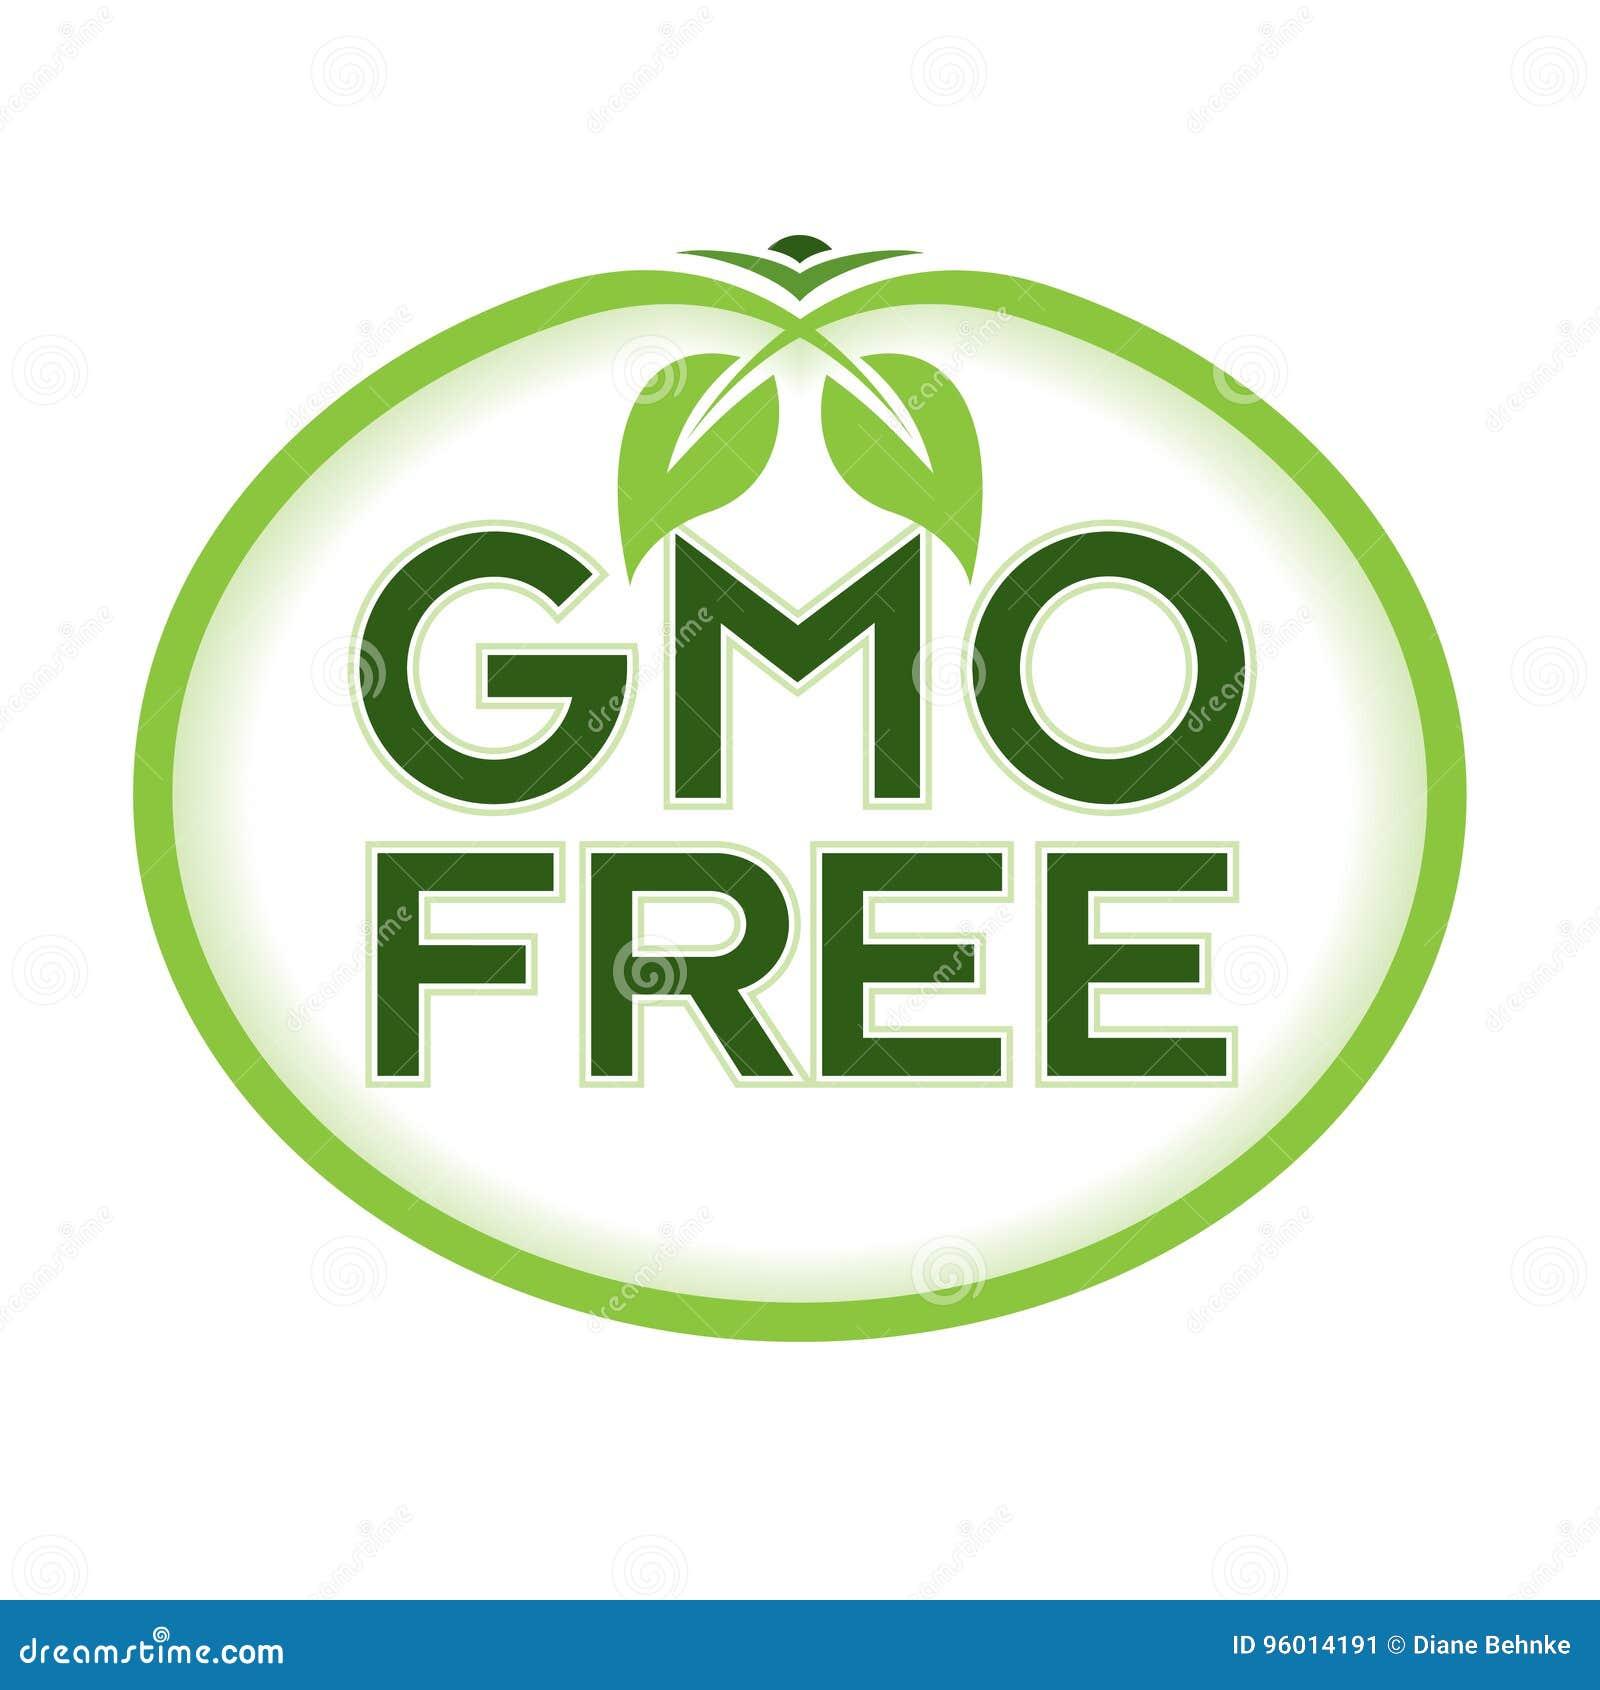 Gmo free logo icon symbol stock vector illustration of grocery gmo free logo icon symbol buycottarizona Images